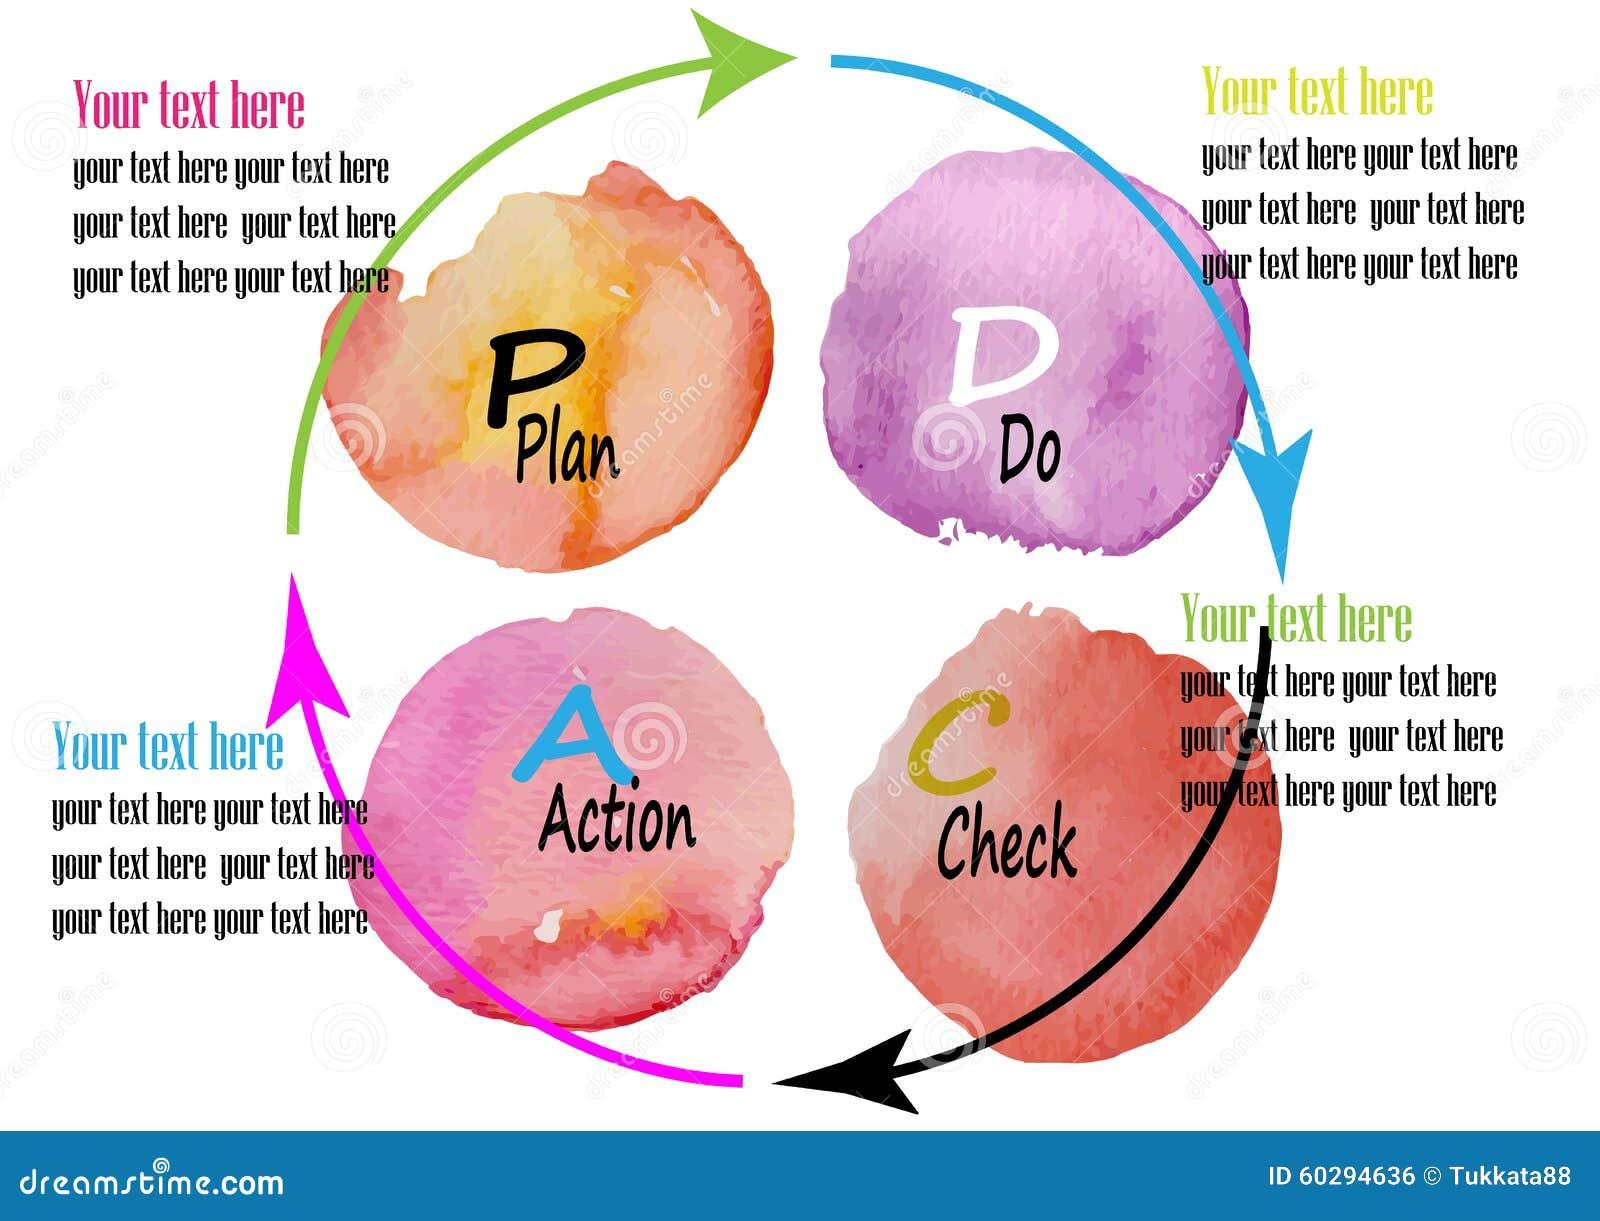 PD το ασβέστιο, σχέδιο, ελέγχει, ΝΑ ΕΝΕΡΓΉΣΕΙ σύστημα διαχείρισης, διανυσματική απεικόνιση σχεδίου watercolor